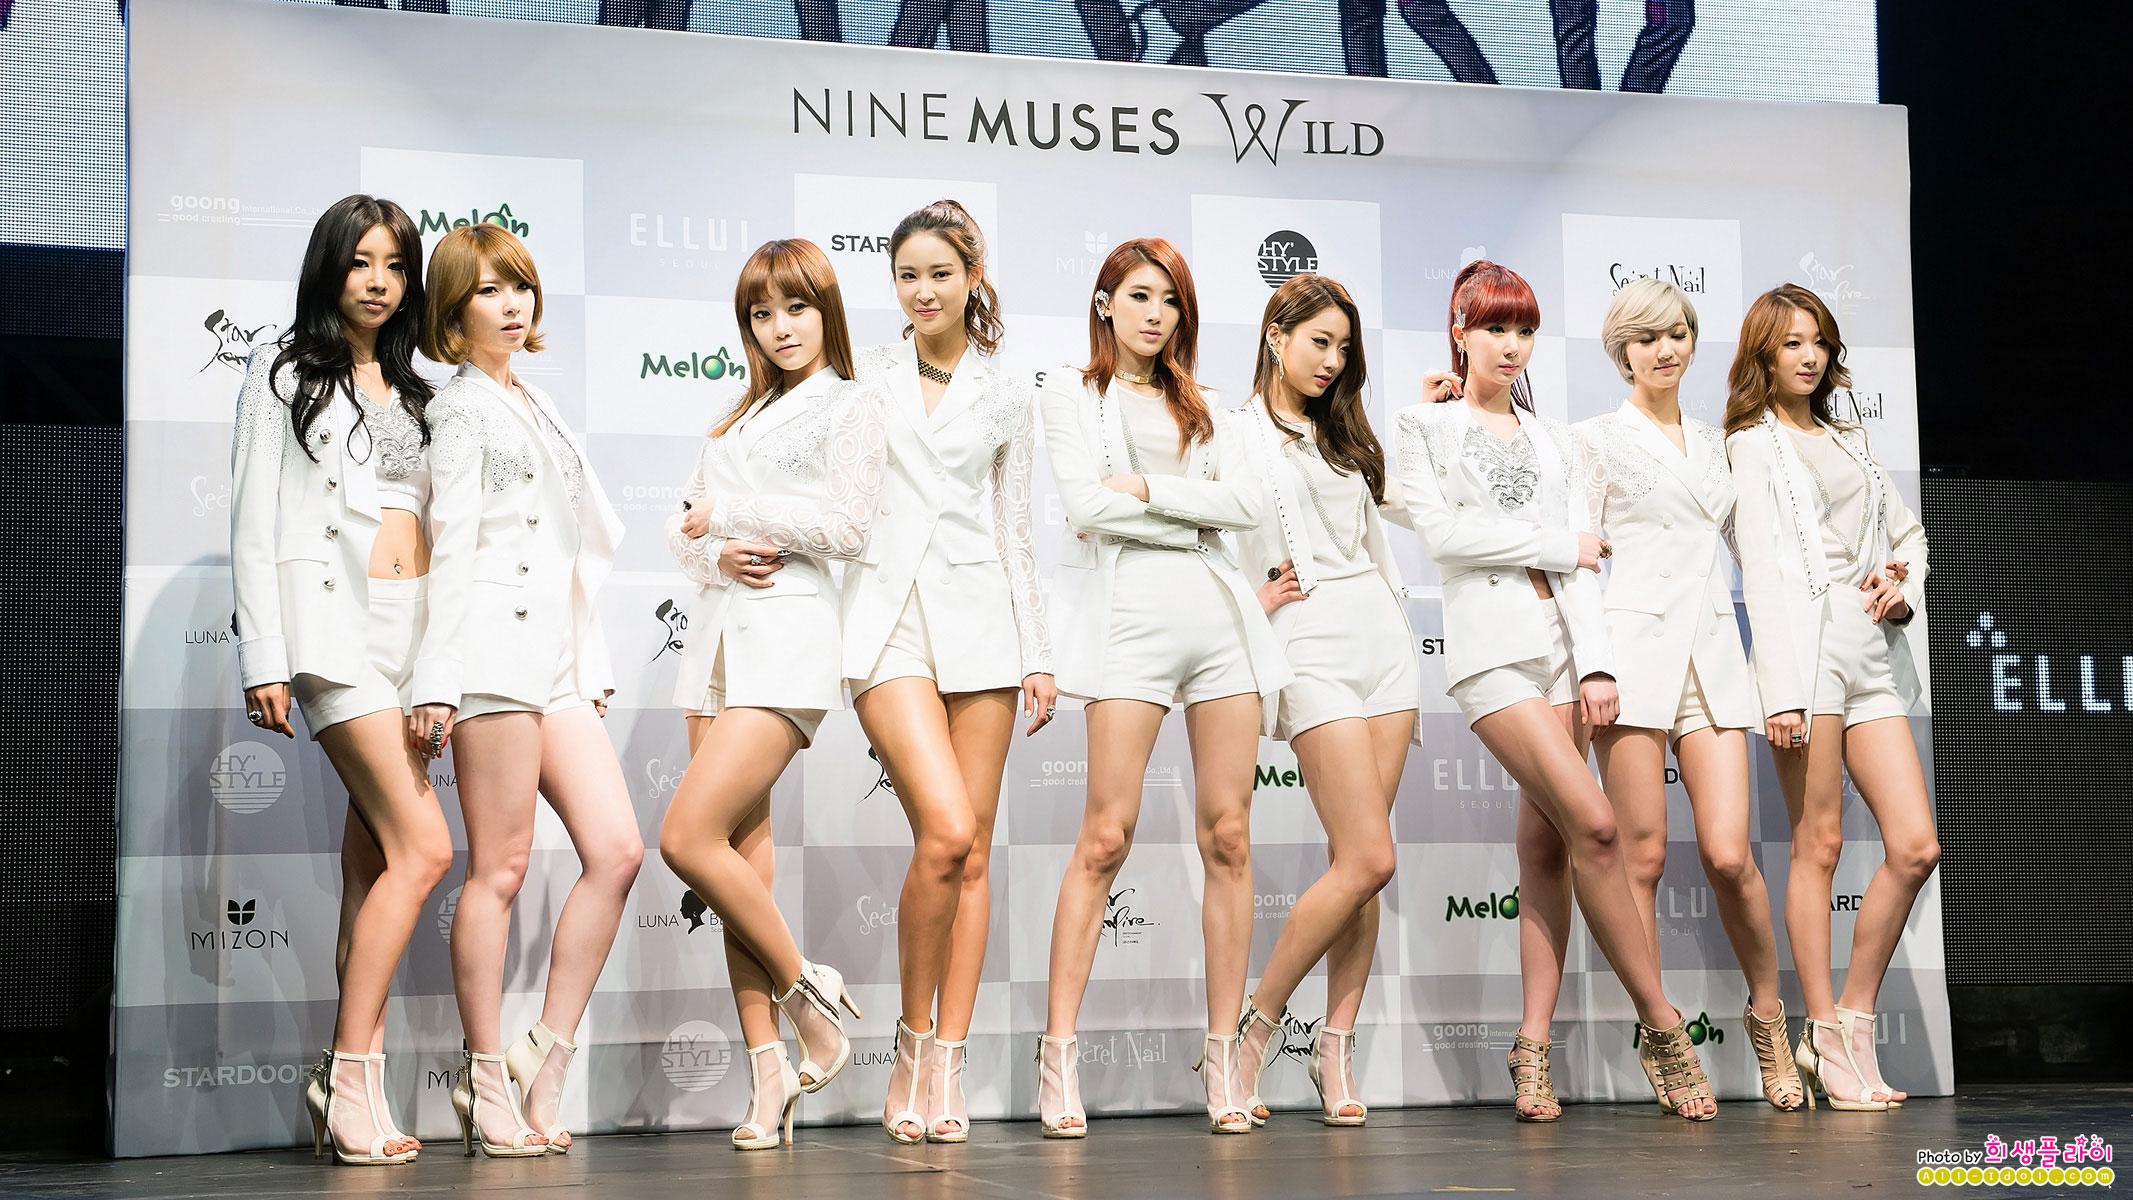 Muses Wild Girl Group Nine Muses Wild